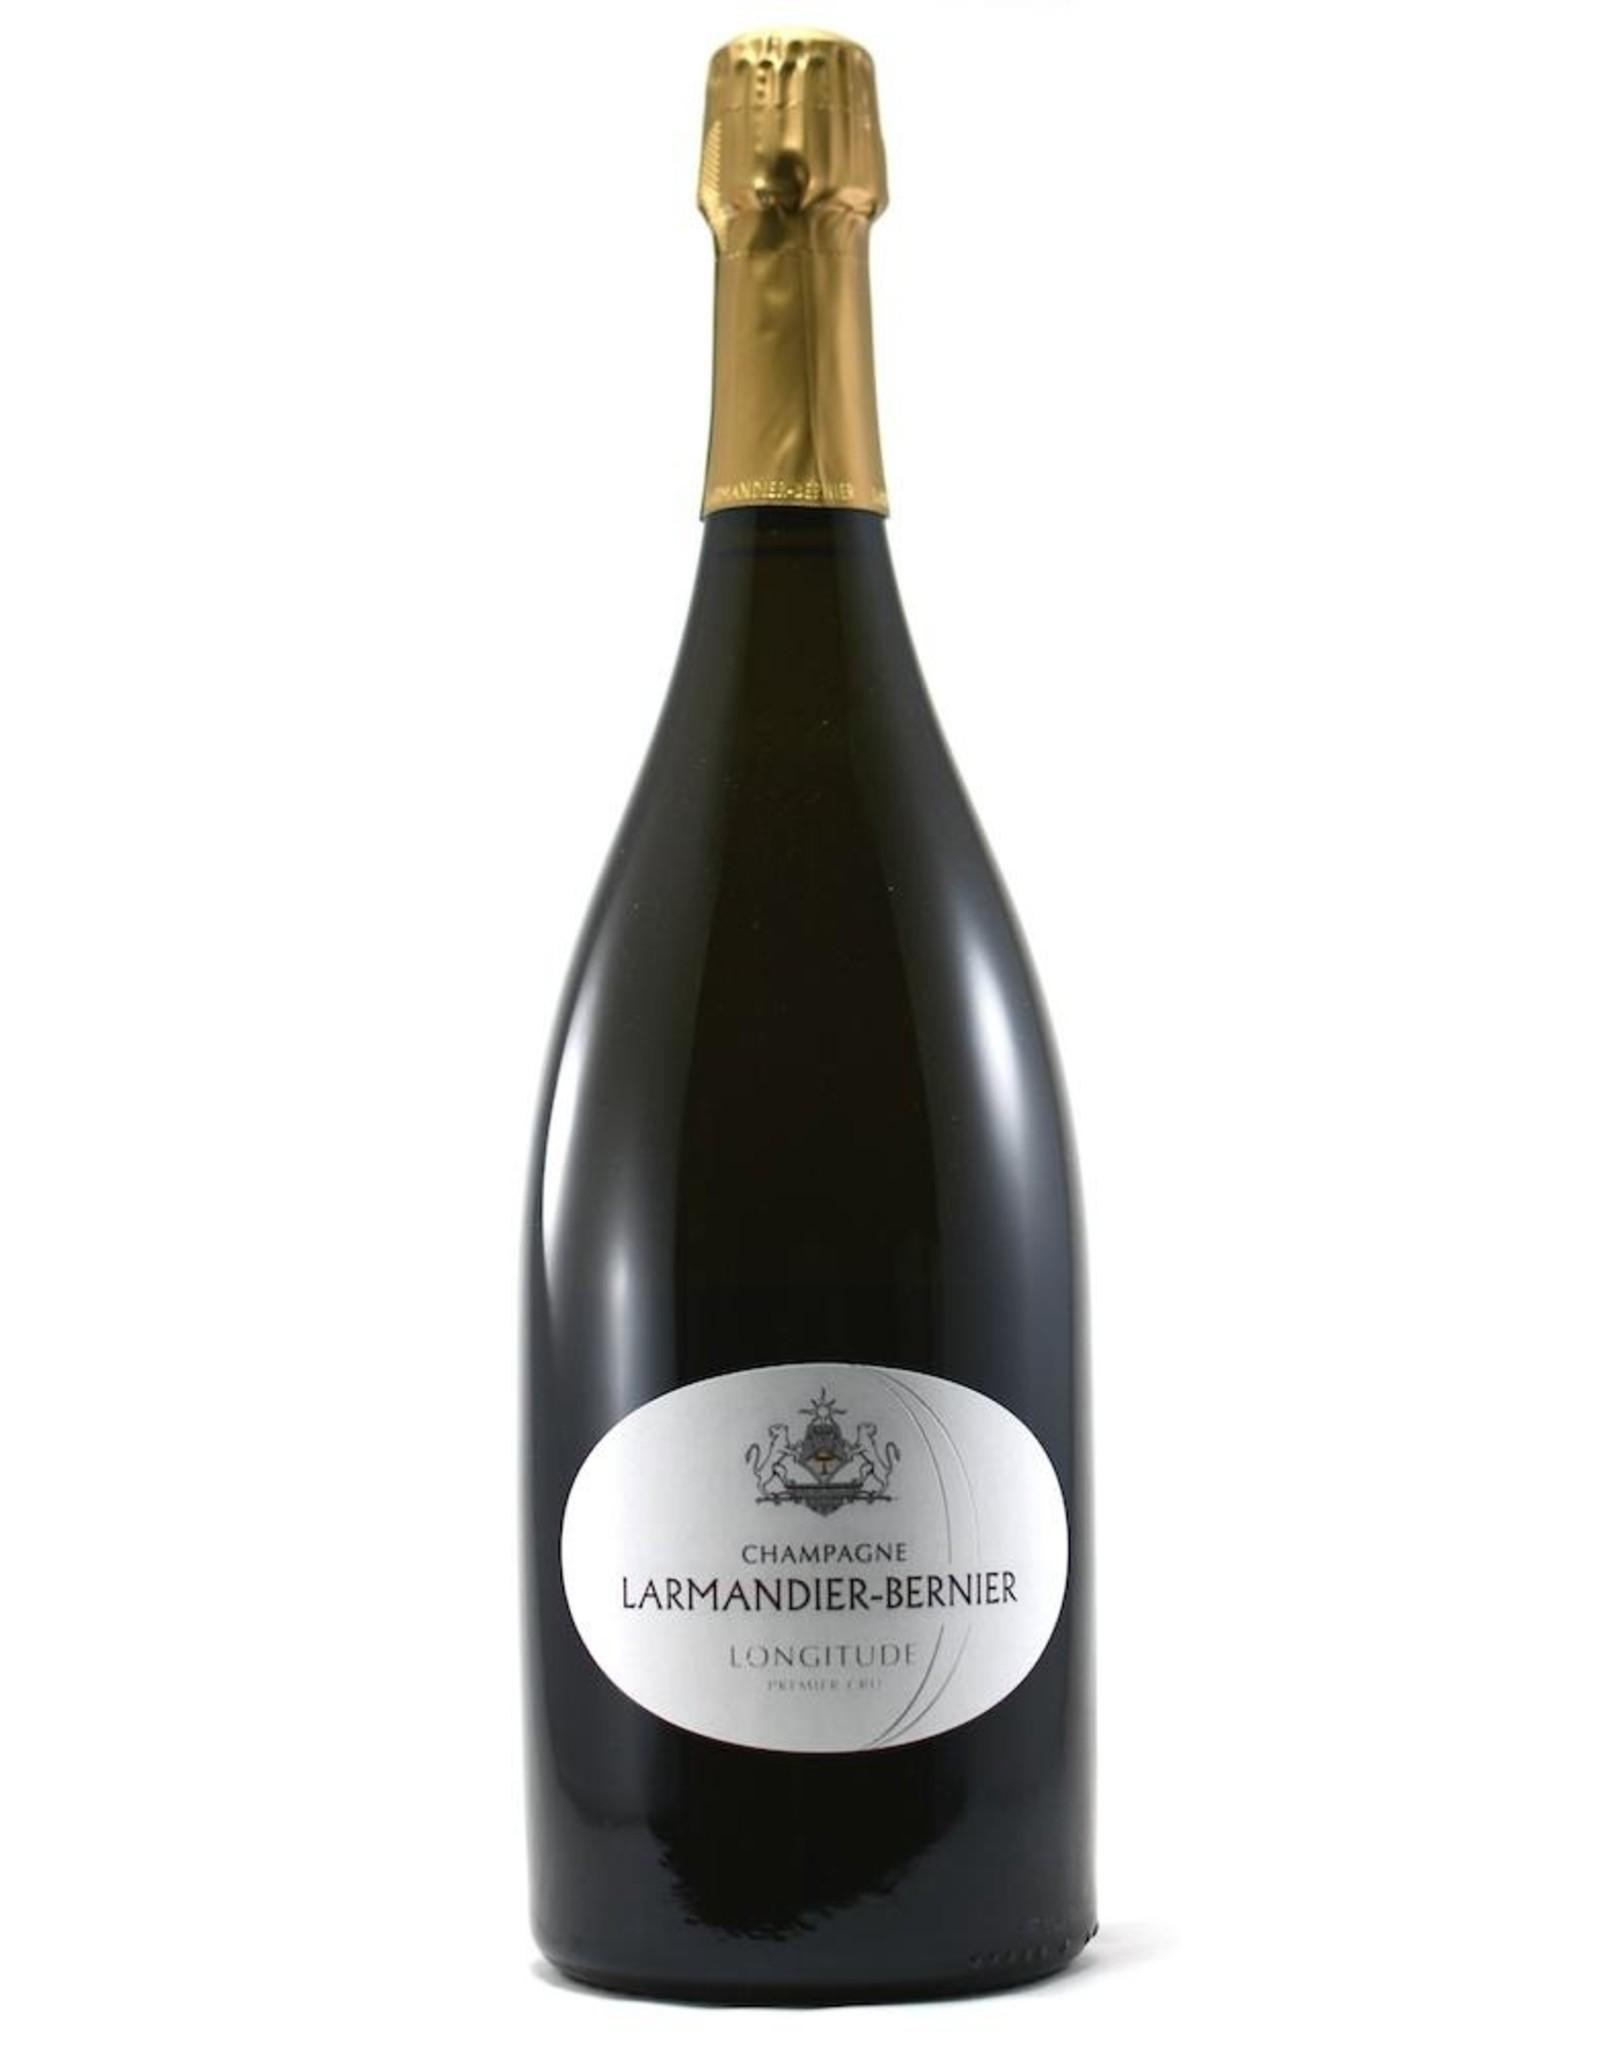 Larmandier-Bernier Longitude Champagne Magnum